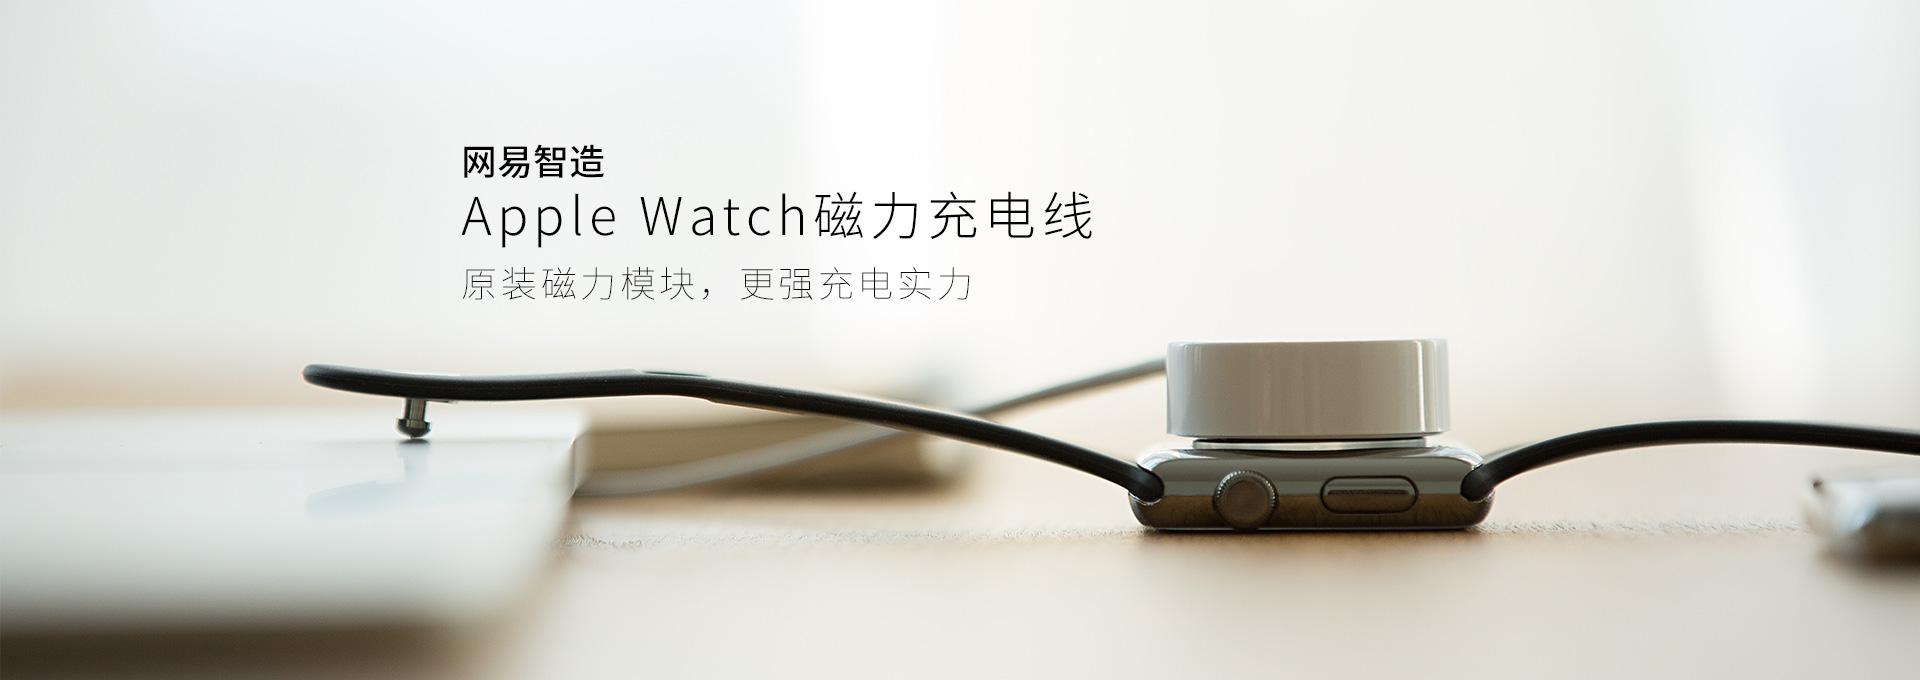 Apple Watch磁力充电线